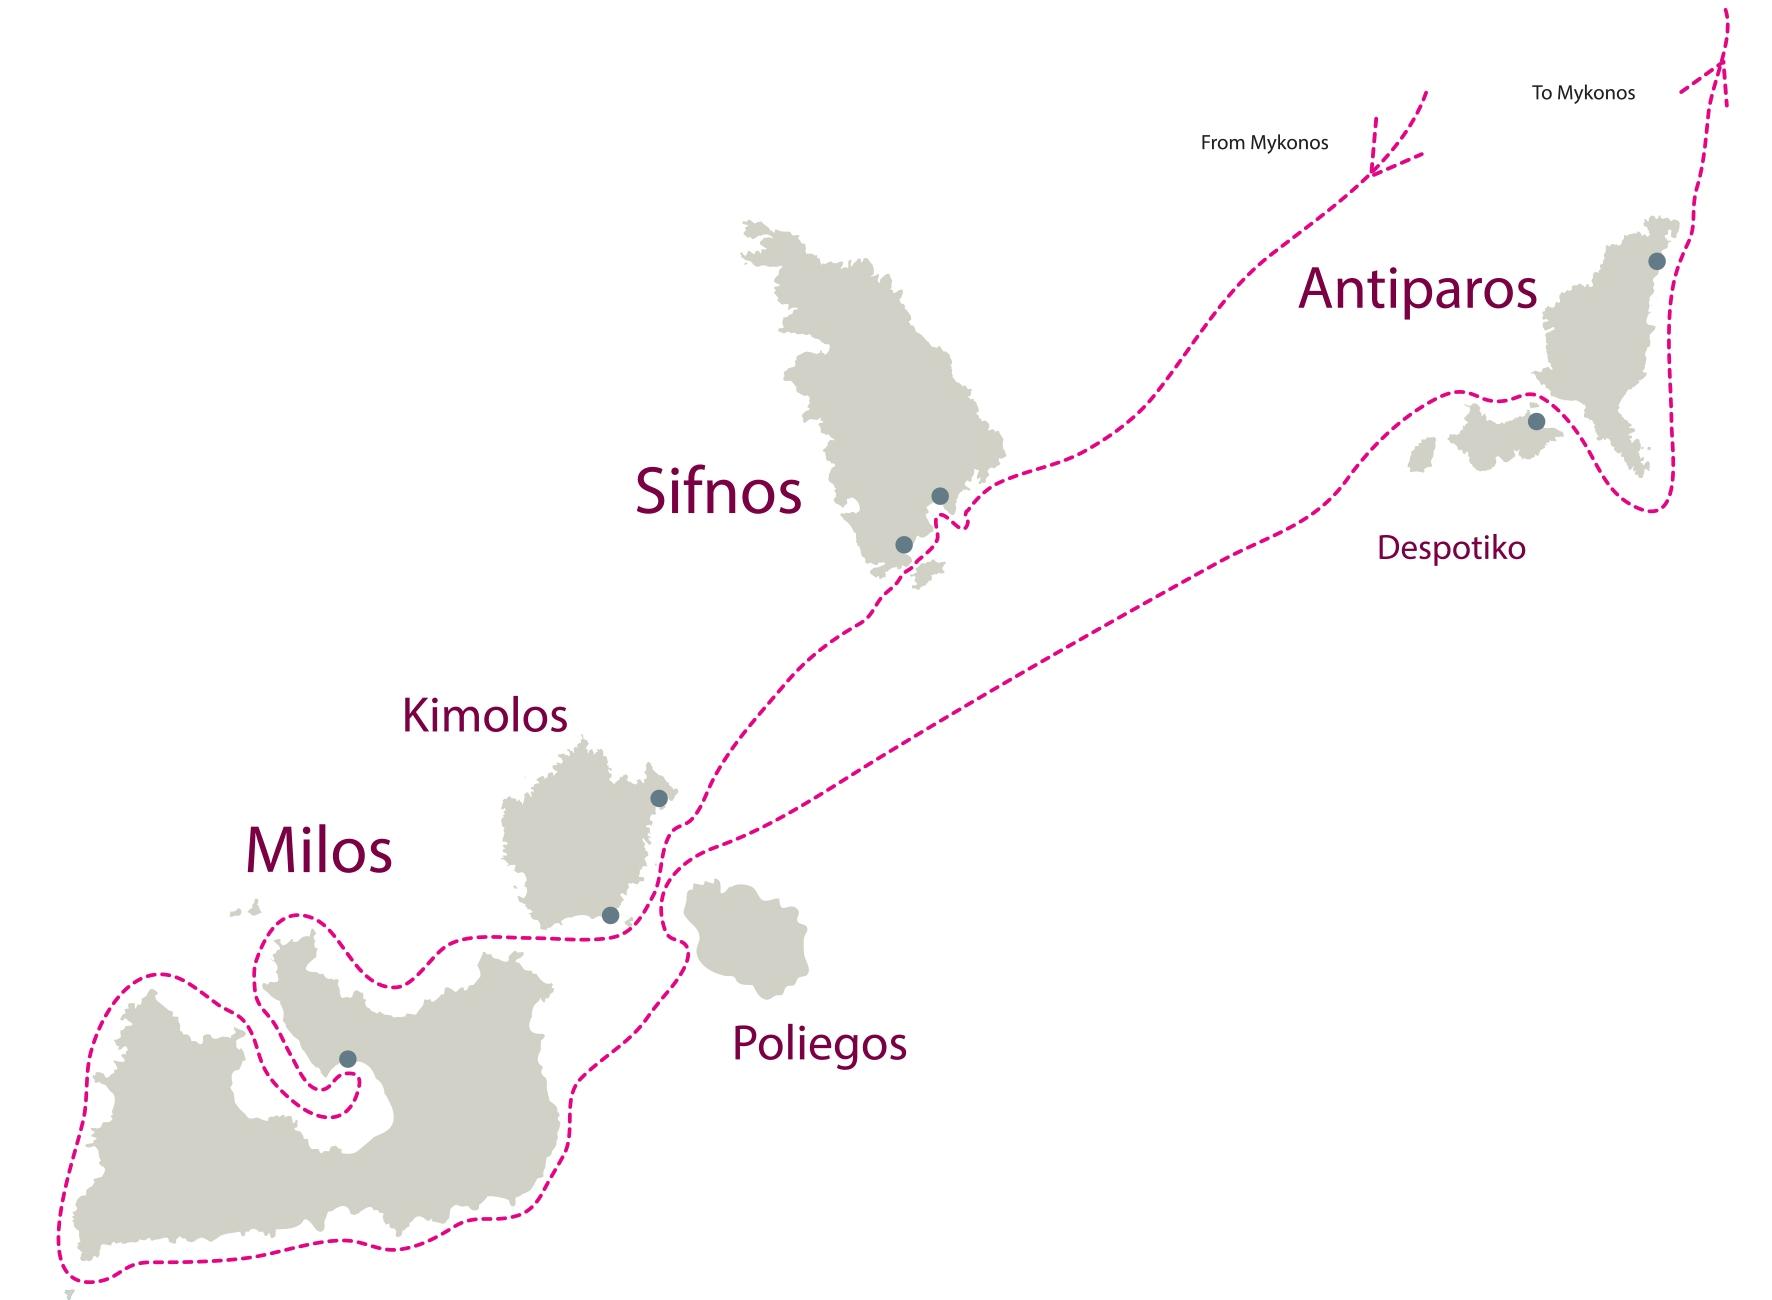 Don Blue Yacthing - Private Cruise - Sifnos Kimolos Milos Antiparos Route